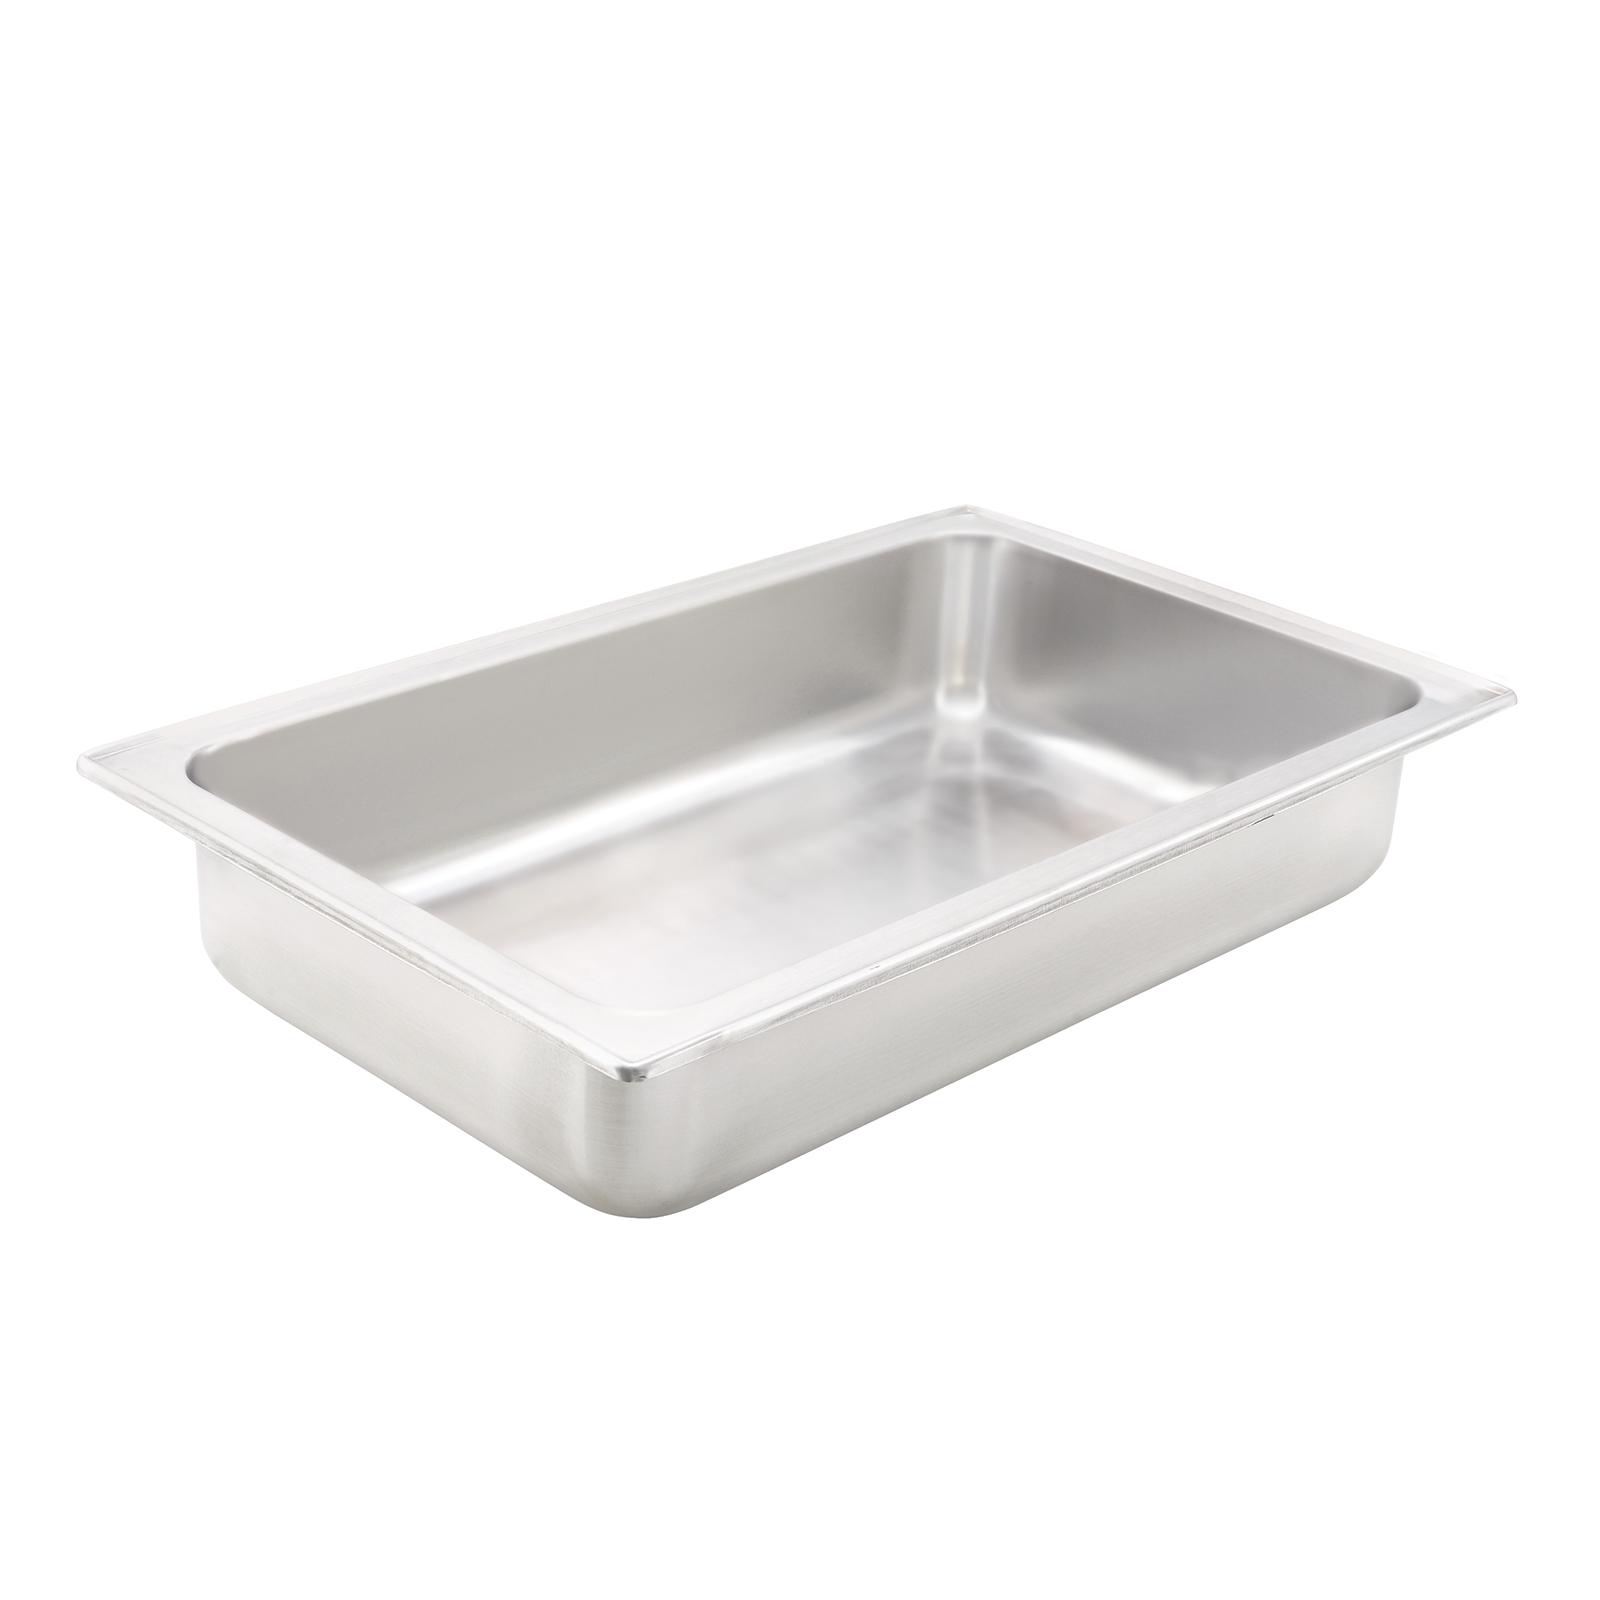 2850-3 Winco C-WPF chafing dish pan